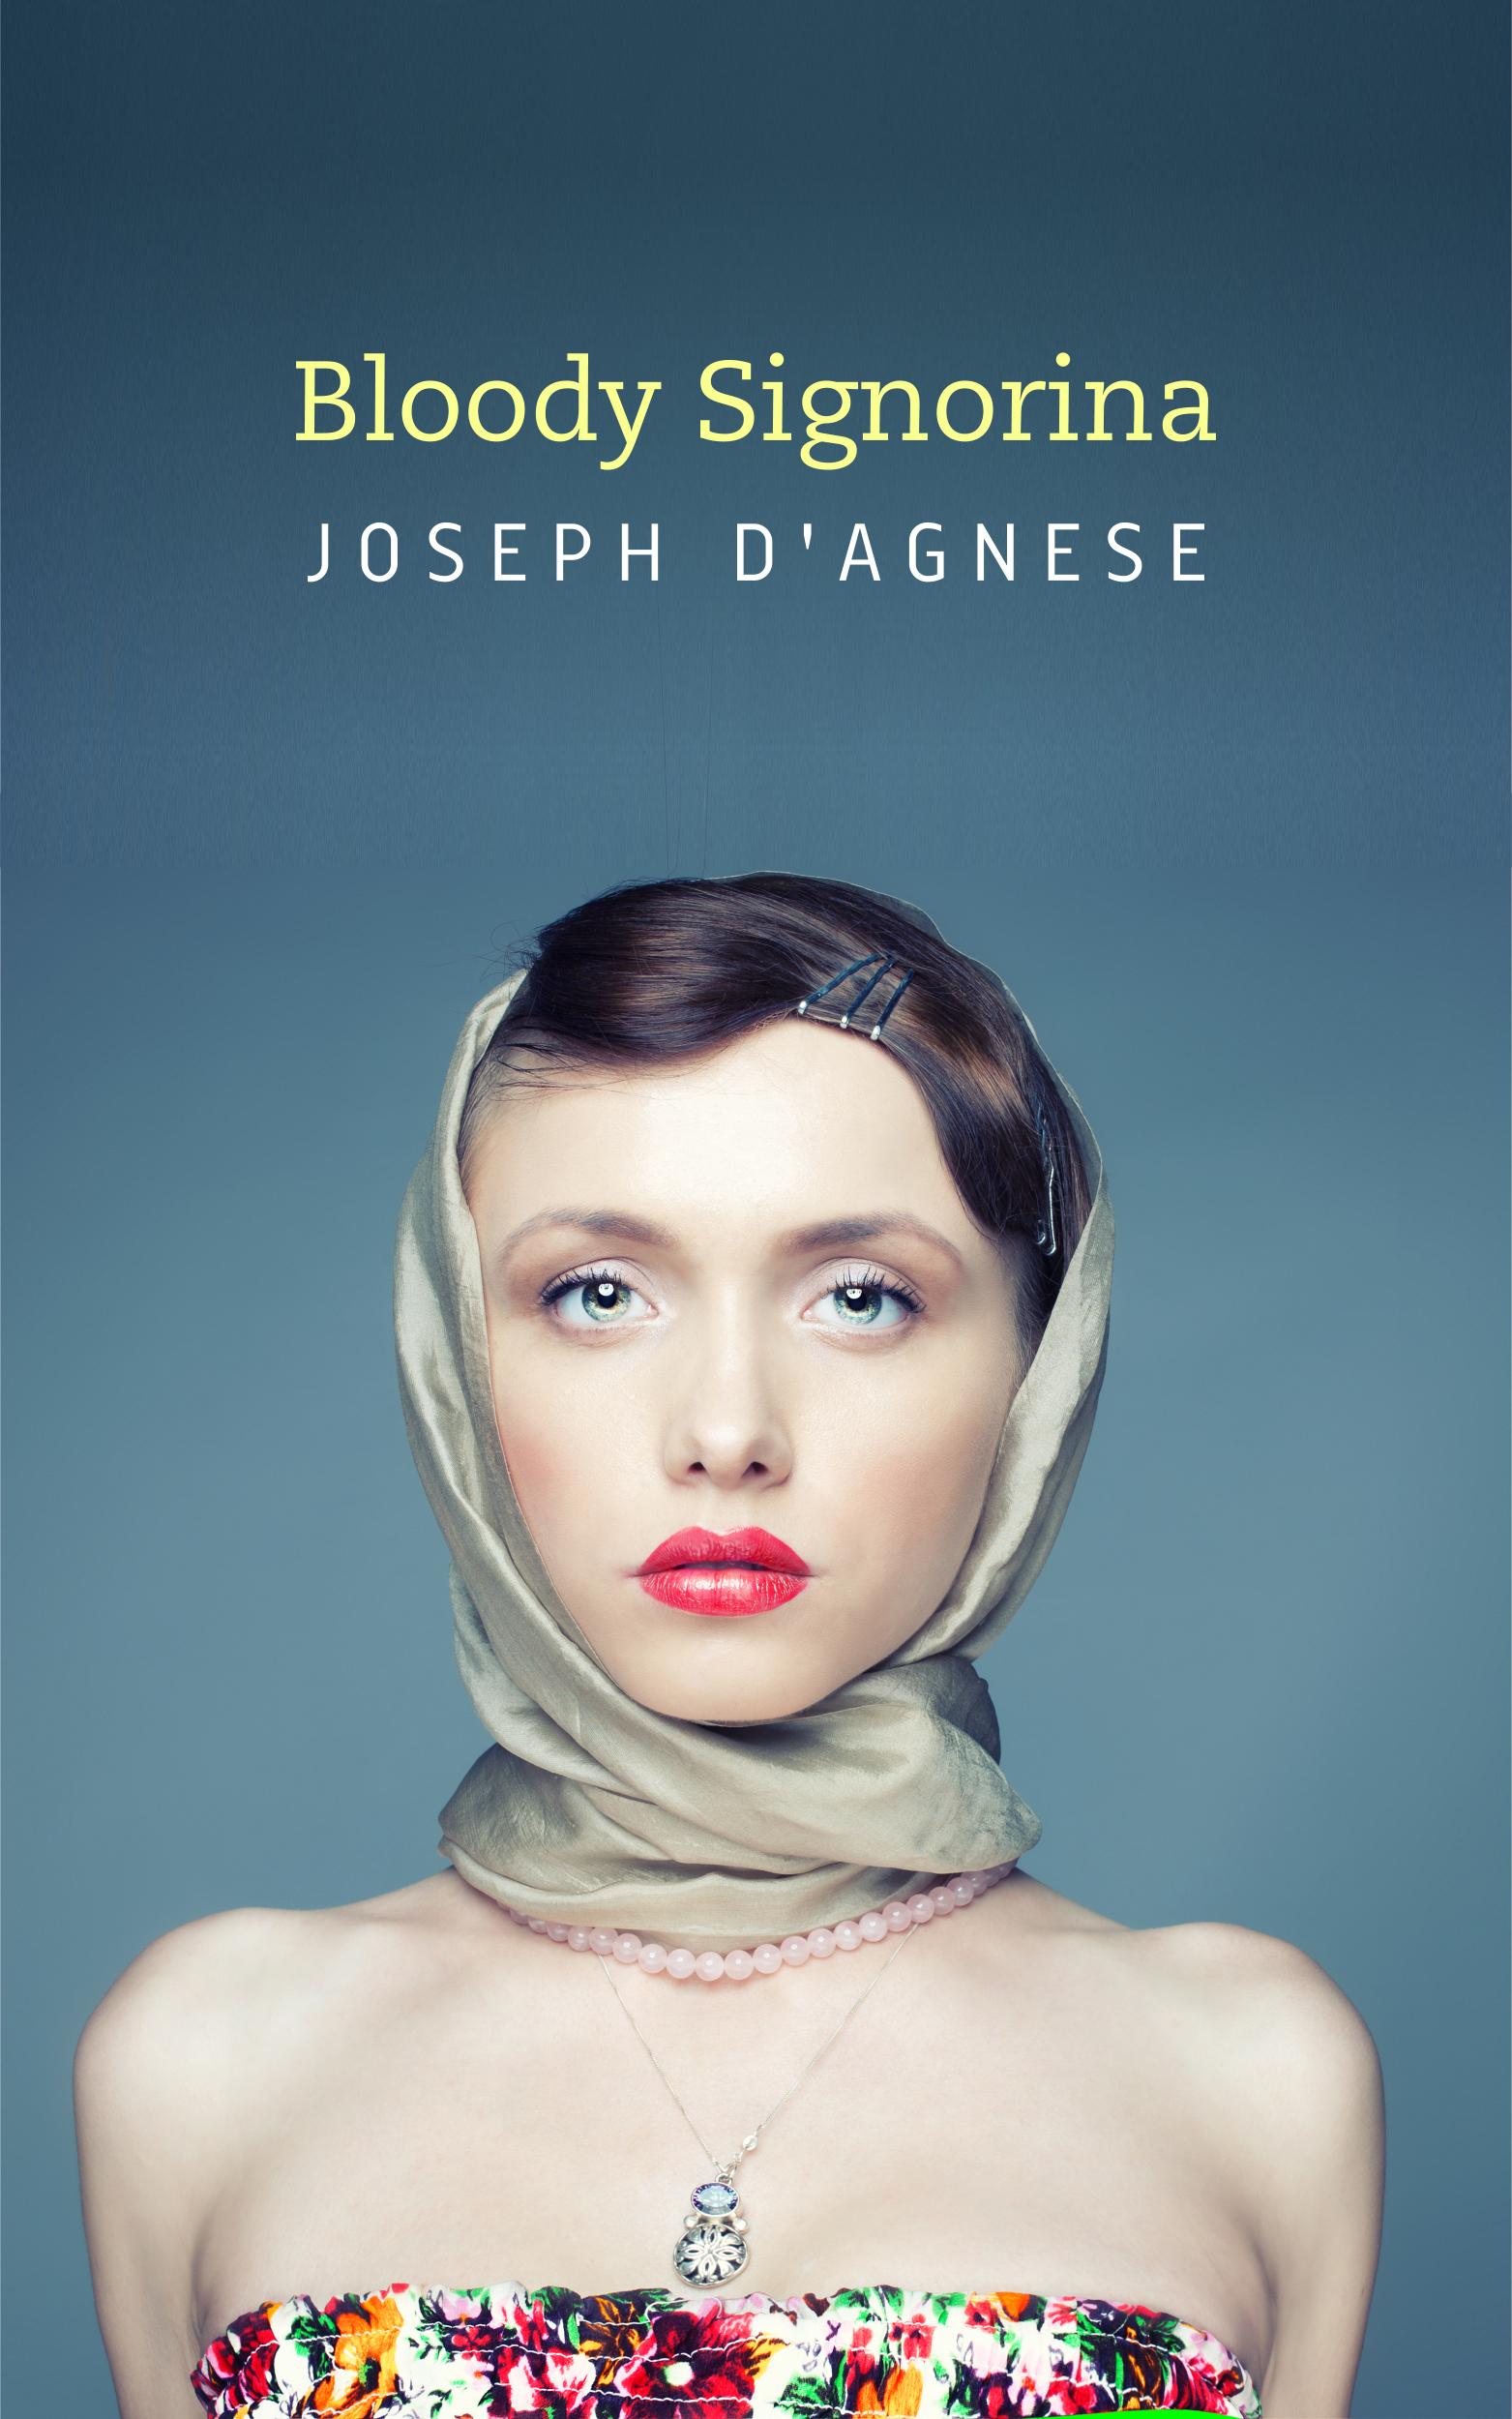 Bloody Signorina by Joseph D'Agnese